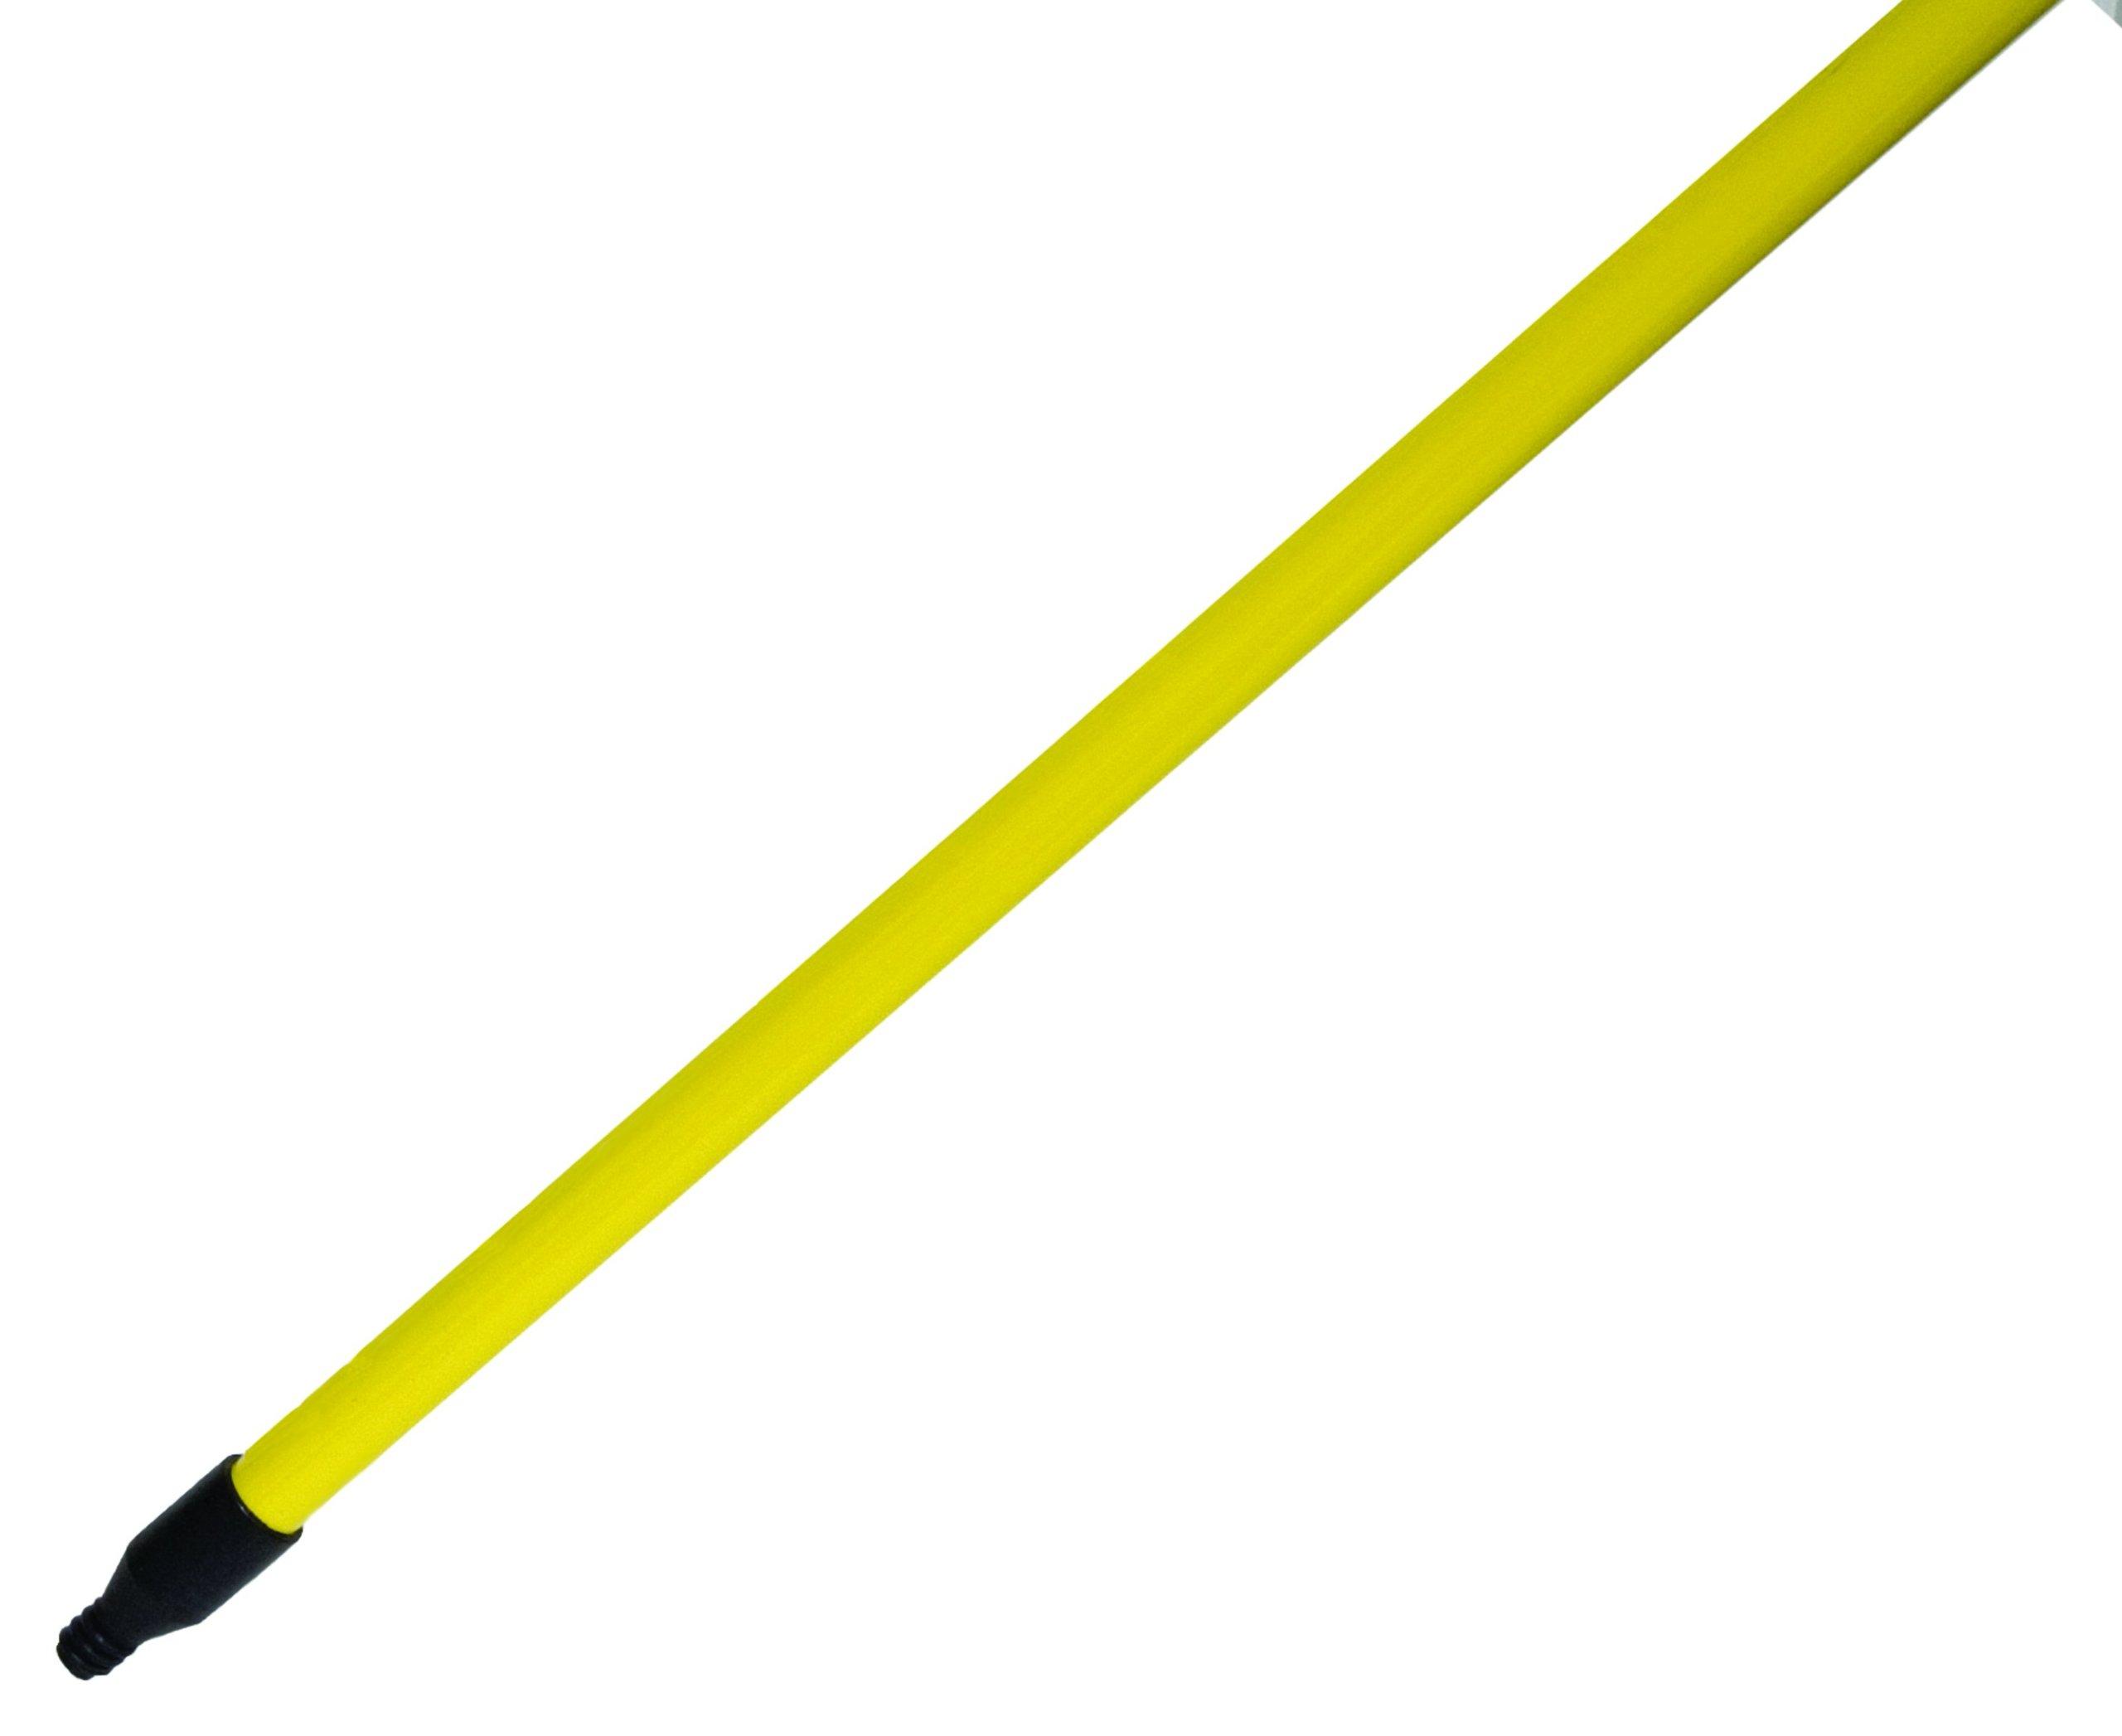 Magnolia Brush EC-FG60 Fiberglass Economy Handle, 1'' Diameter x 60'' Length, Yellow (Case of 12)